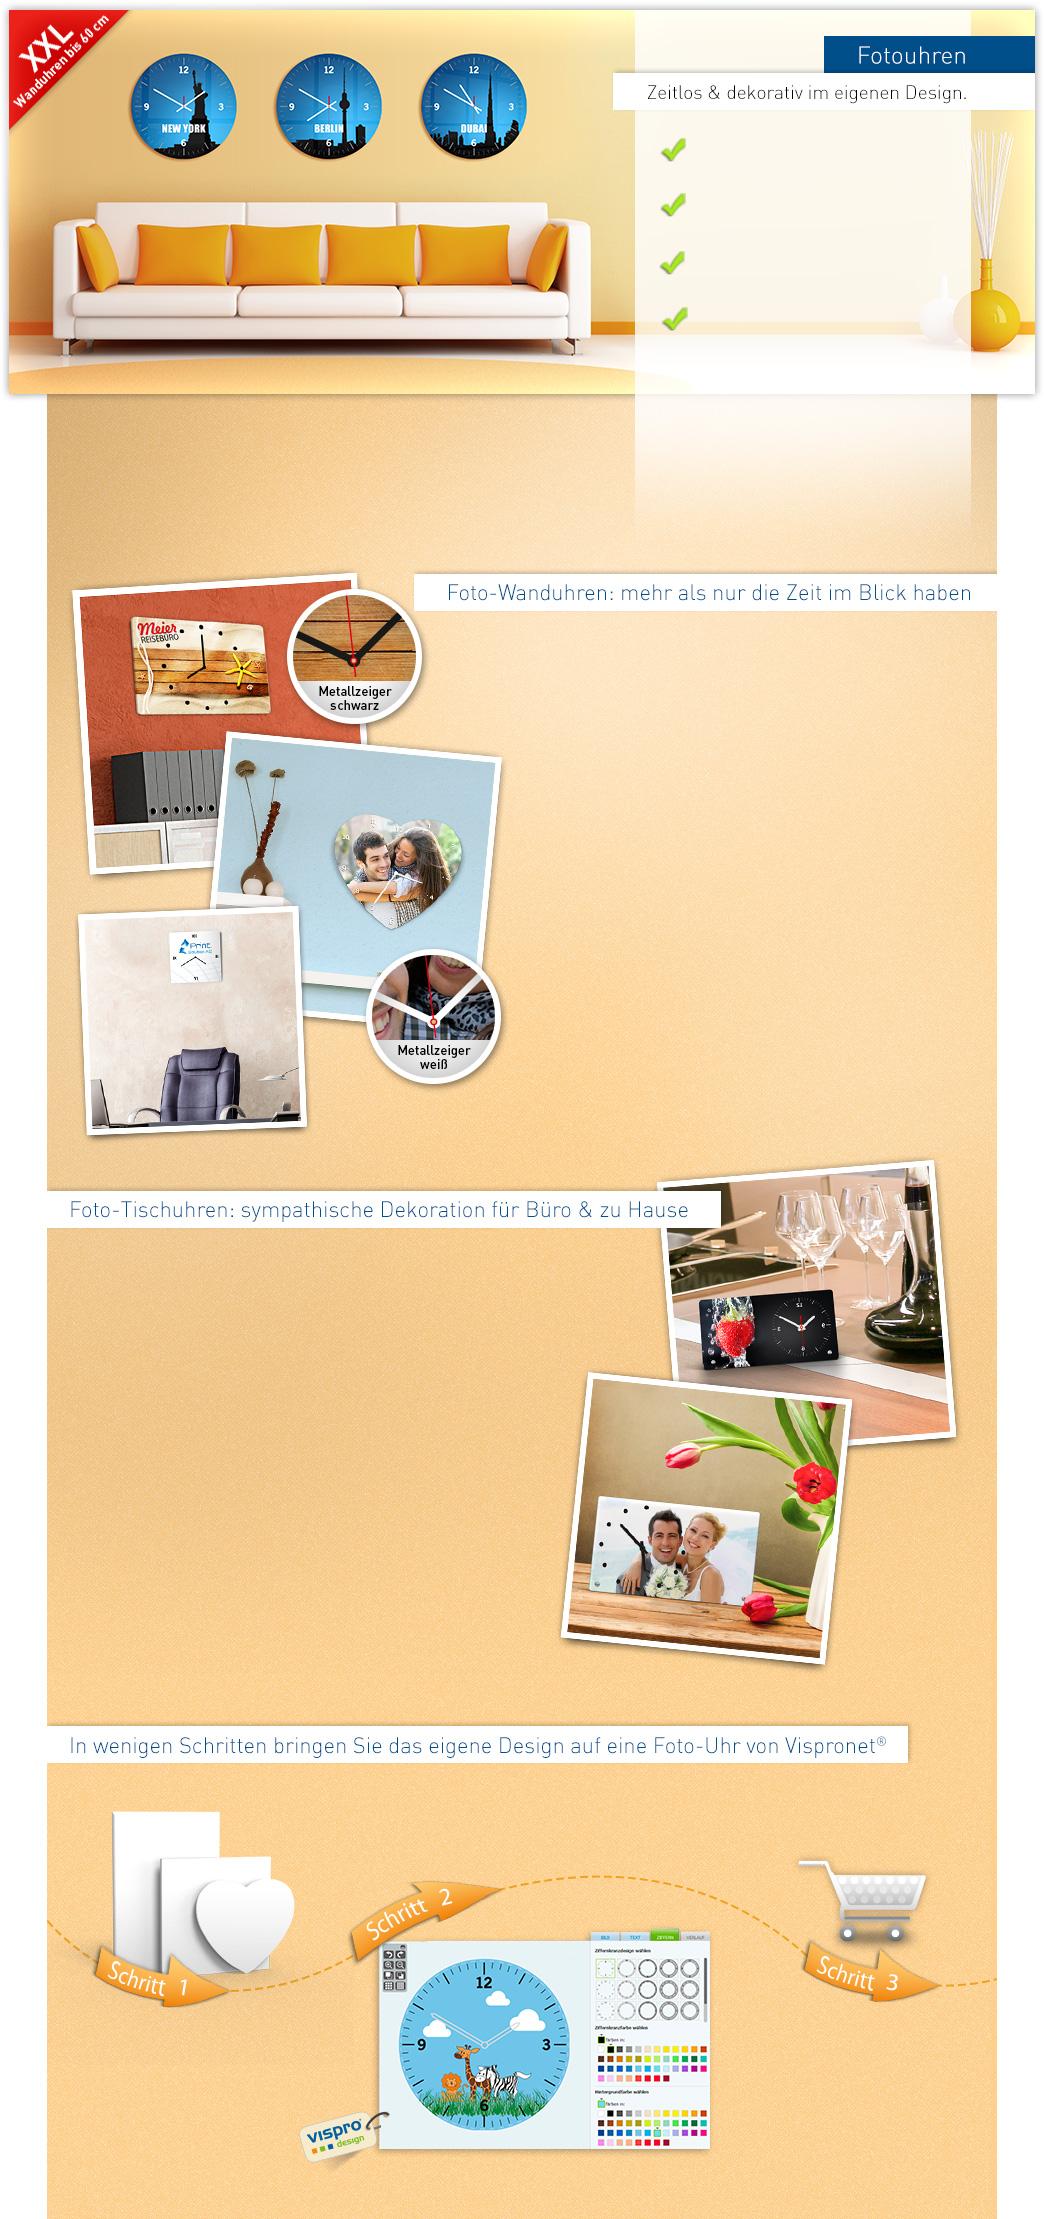 fotouhren drucken wanduhren tischuhren selbst gestalten. Black Bedroom Furniture Sets. Home Design Ideas